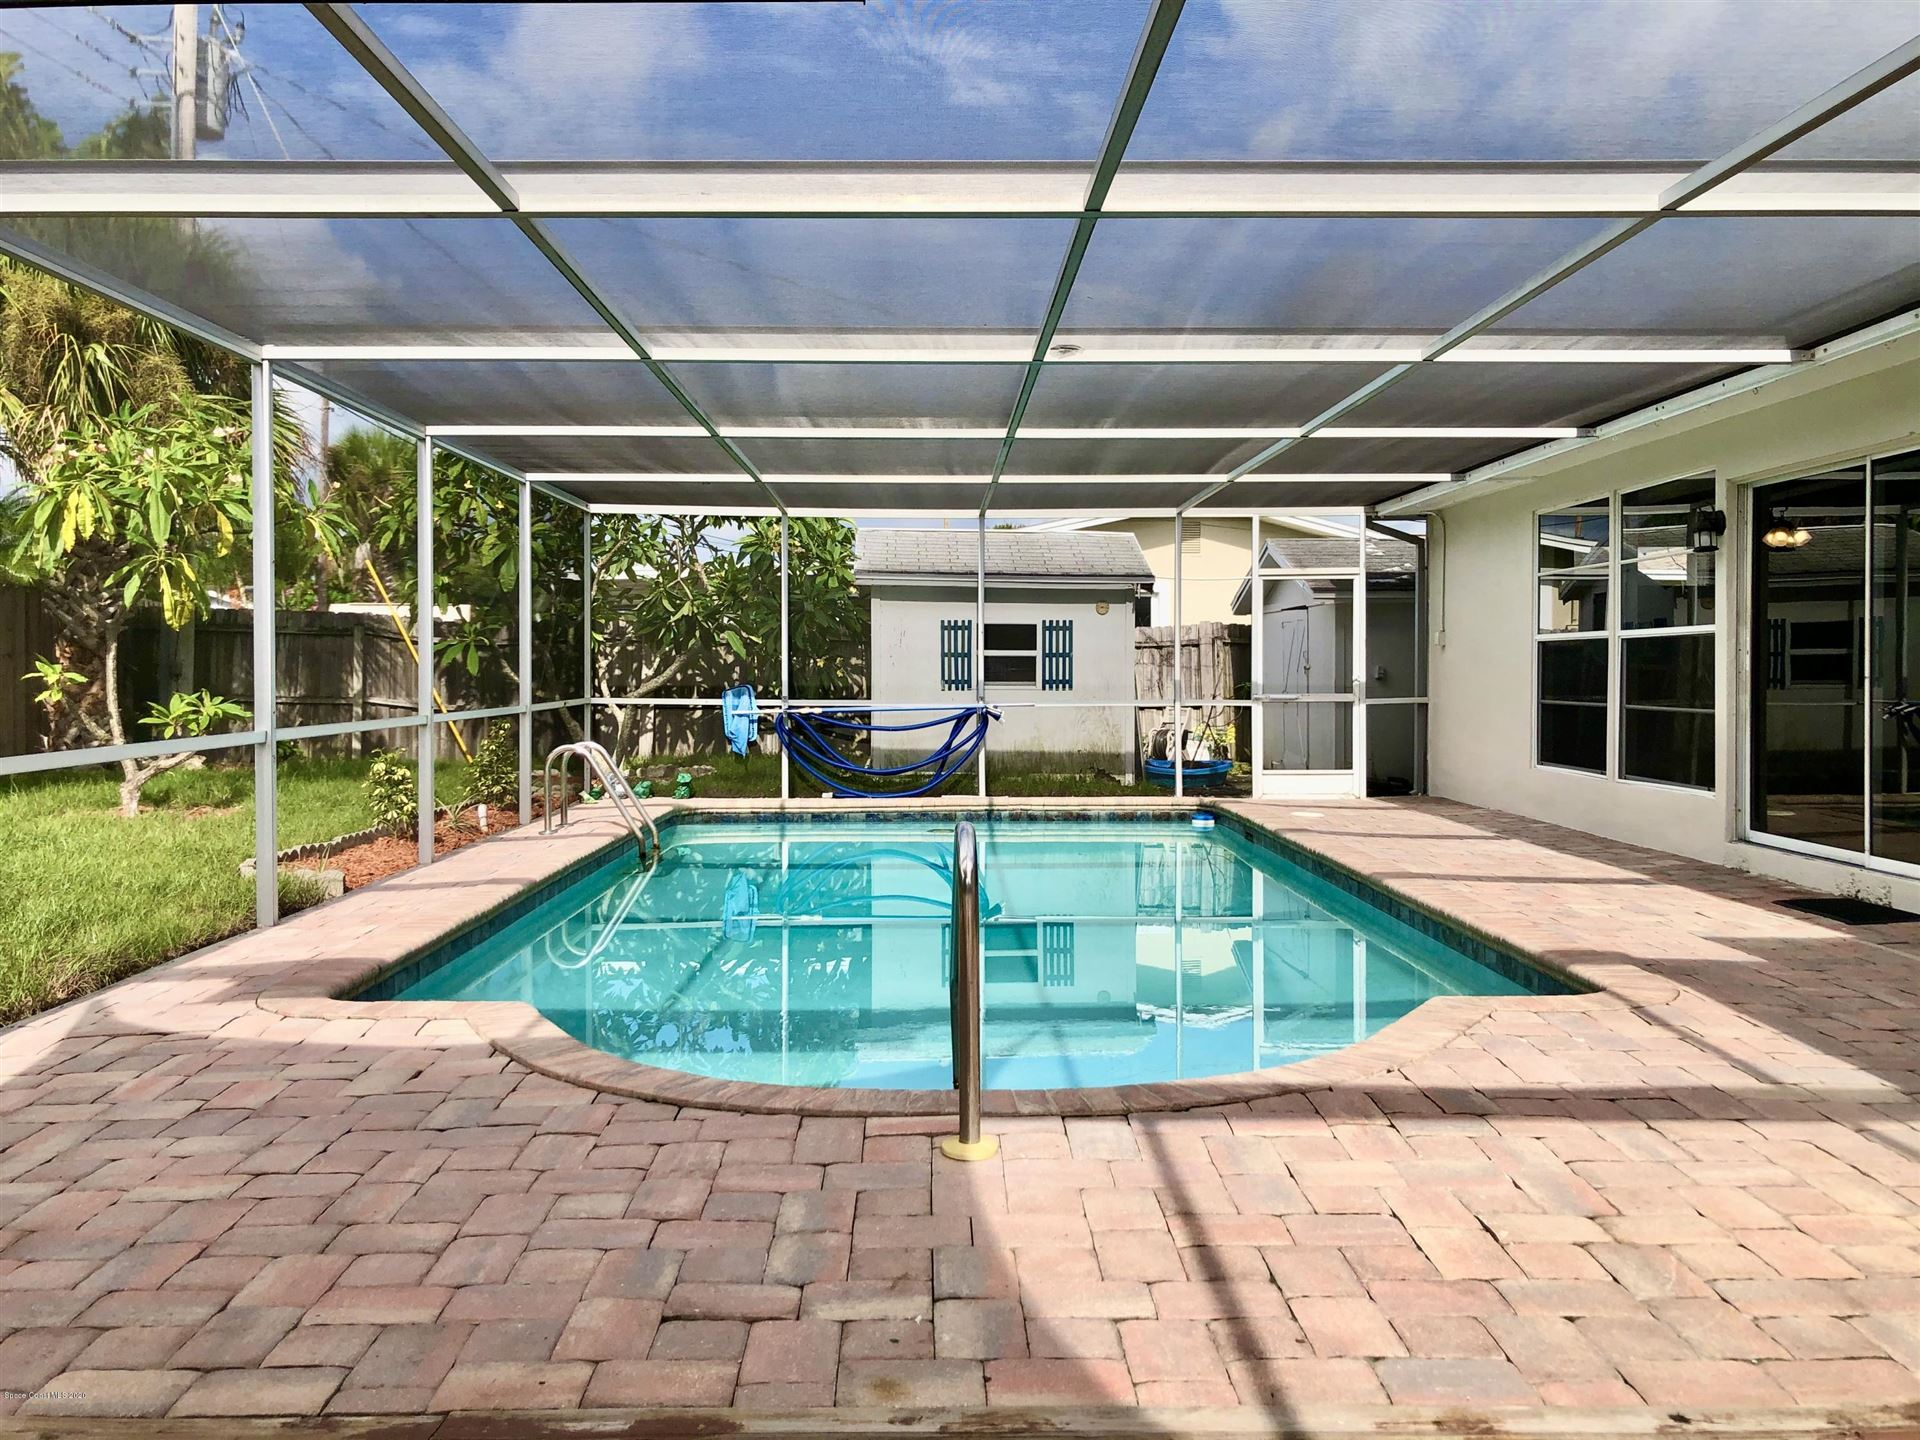 495 Newfound Harbor Dr., Merritt Island, FL 32952 - #: 884725